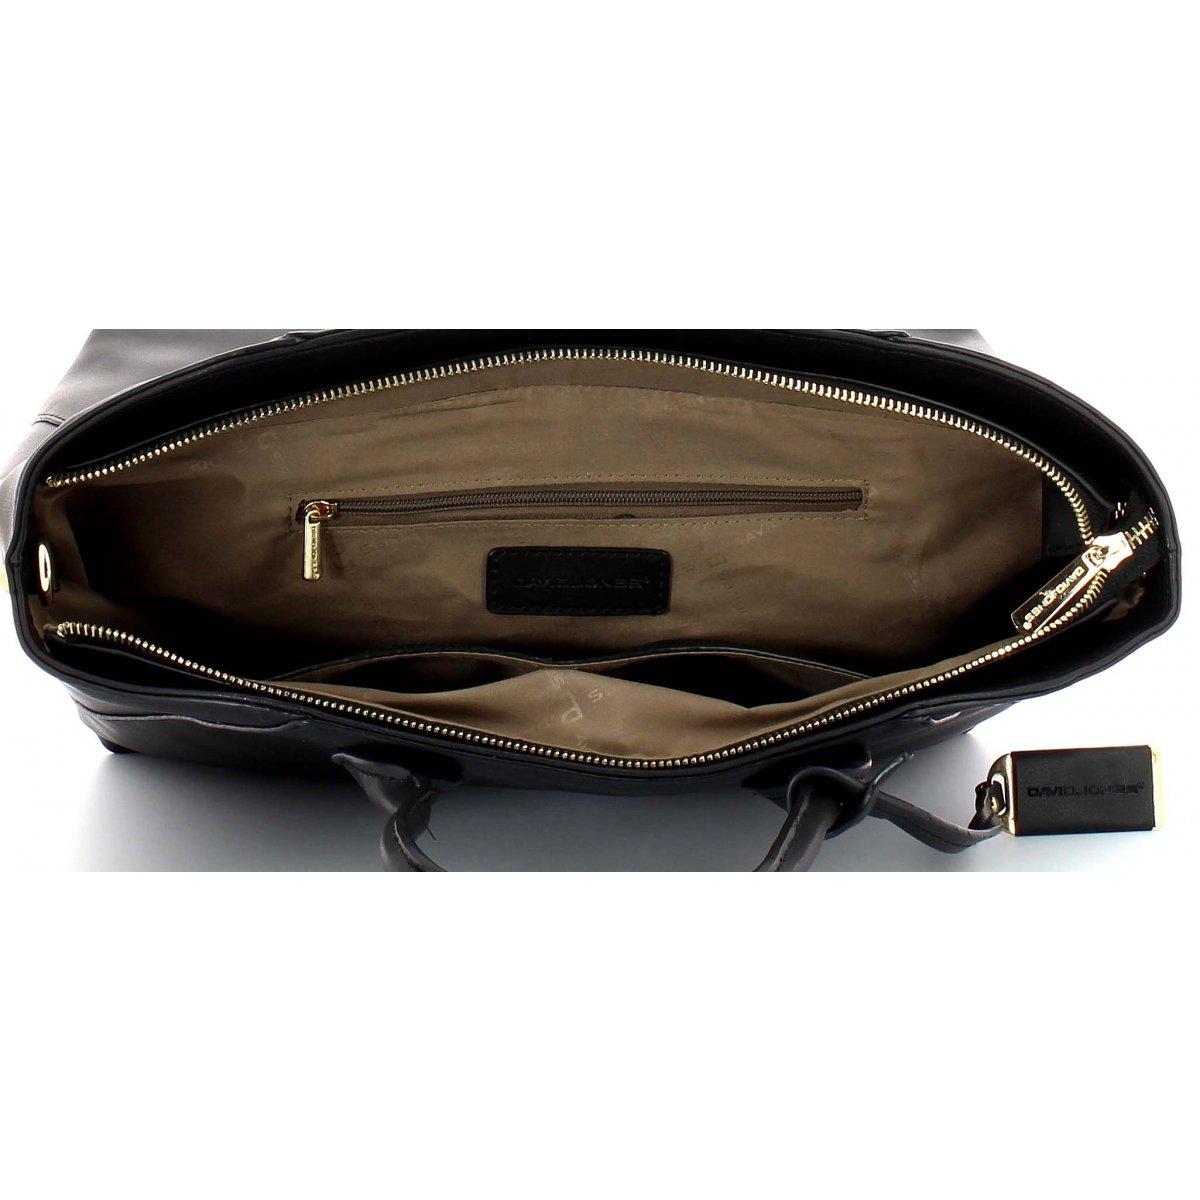 sac main cuir david jones dja13212 couleur principale taupe. Black Bedroom Furniture Sets. Home Design Ideas